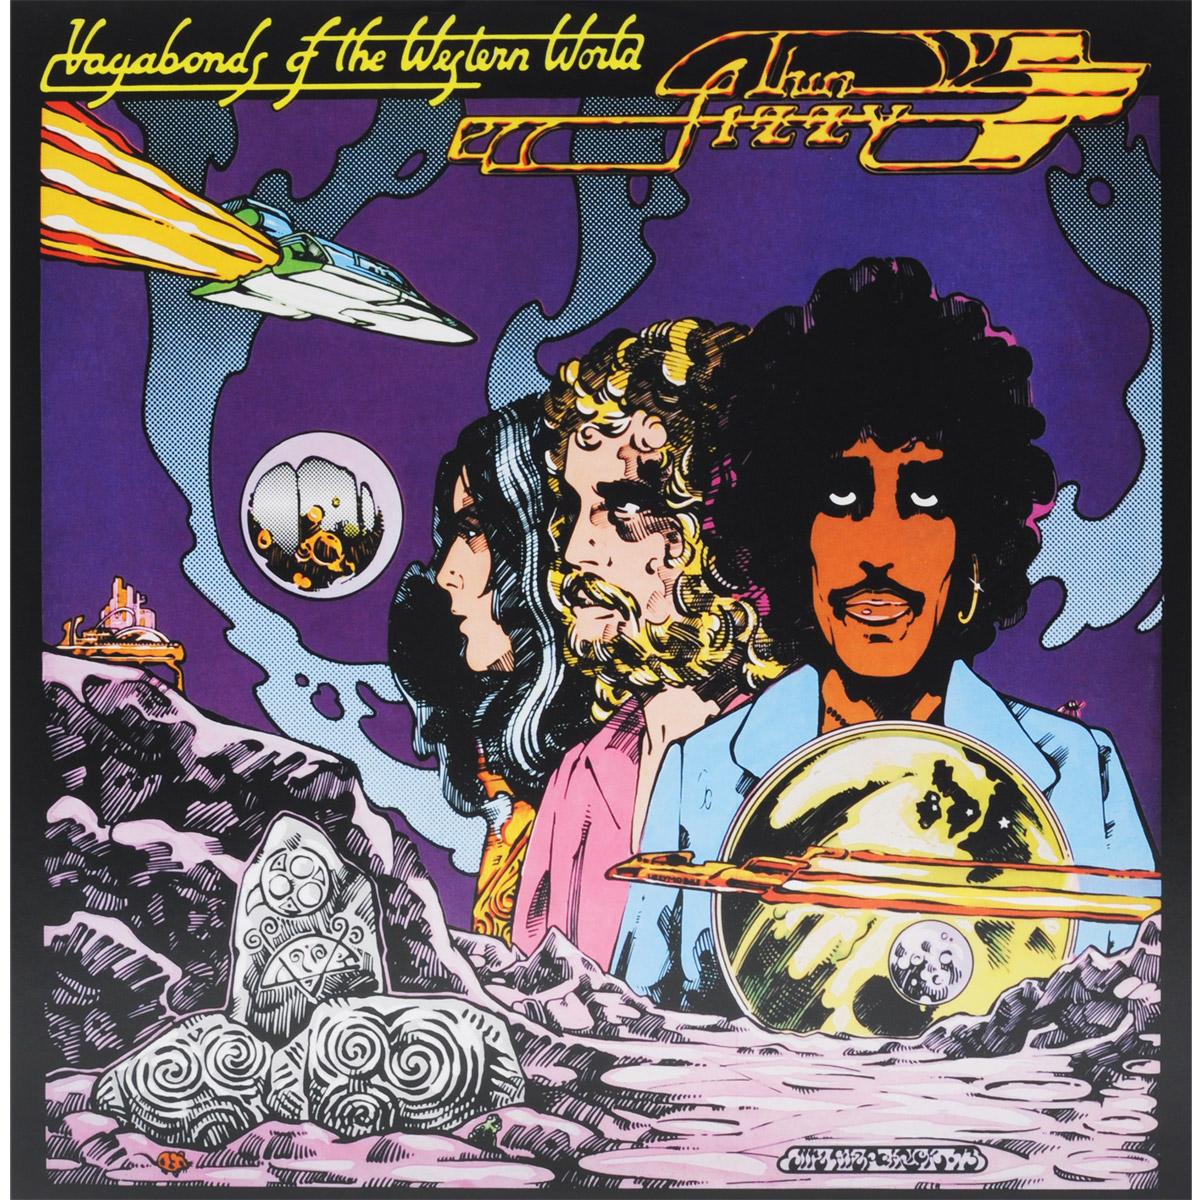 Thin Lizzy Thin Lizzy. Vagabonds Of The Western World (LP) защитная пленка lp универсальная 2 8 матовая